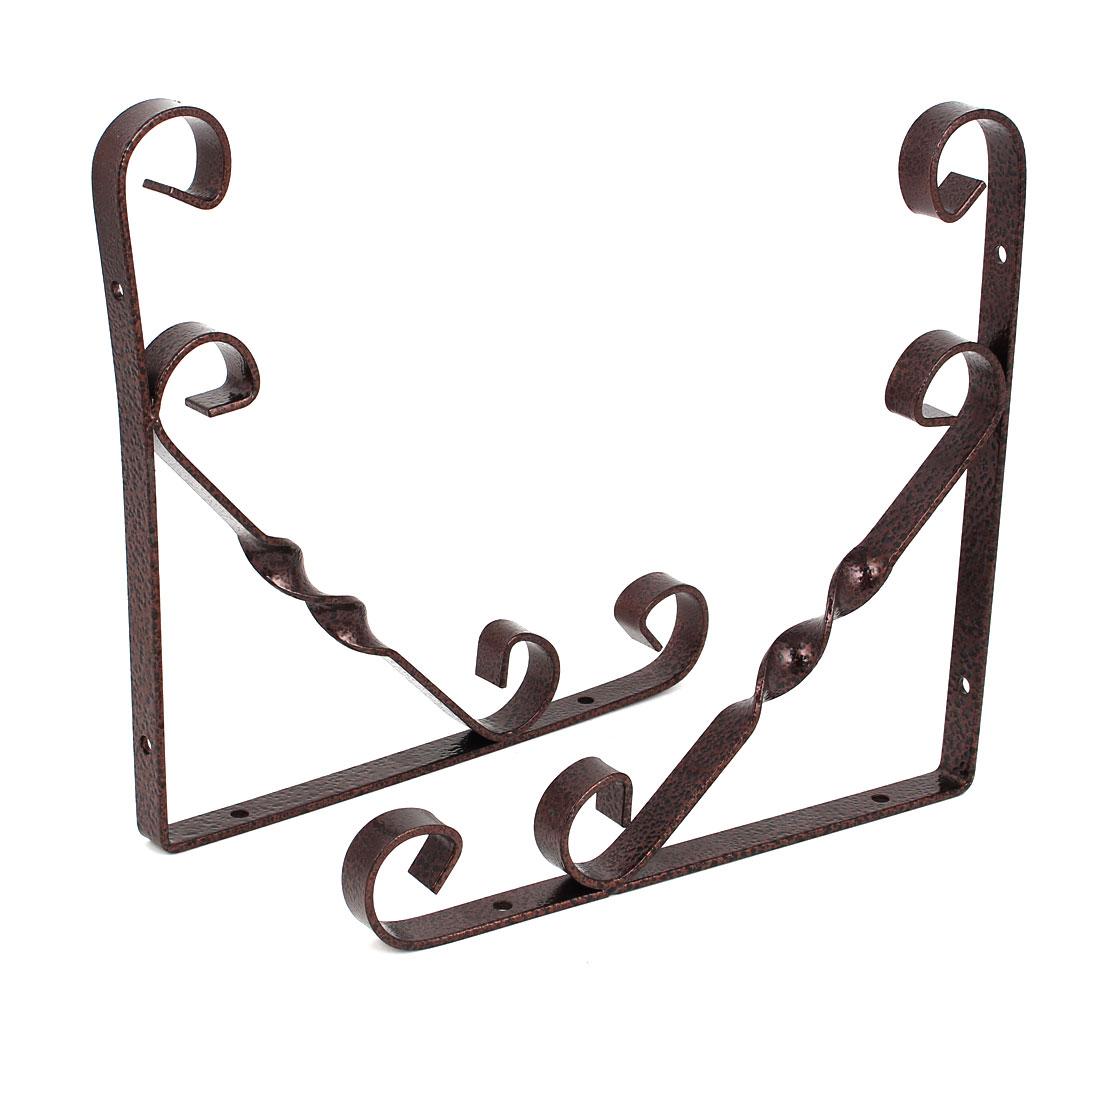 Home Shop Wall Mounted Metal L Shaped Support Shelf Bracket Copper Tone 200x200mm 2pcs